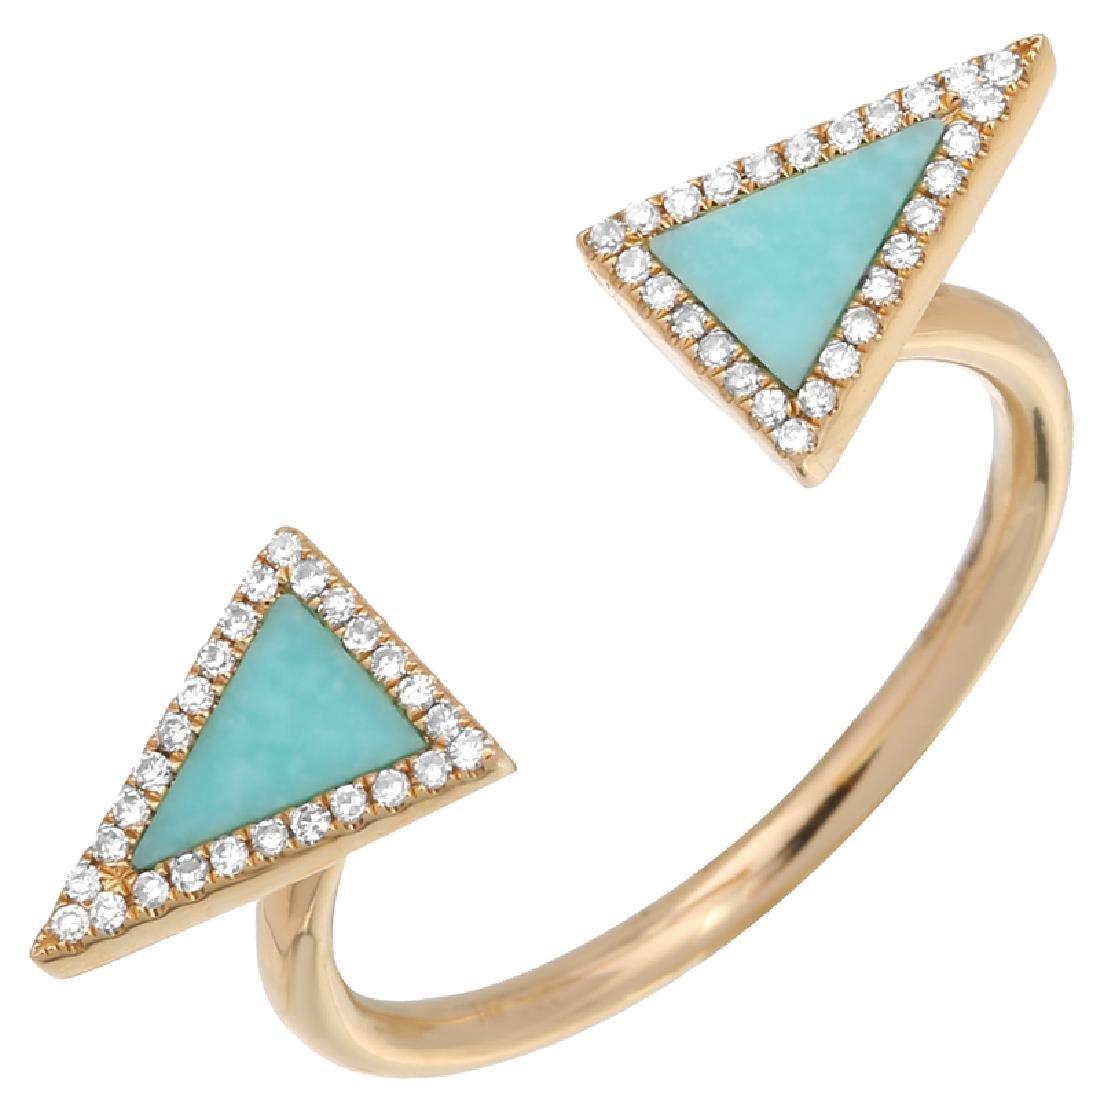 14KT Yellow Gold Gemstone Ring